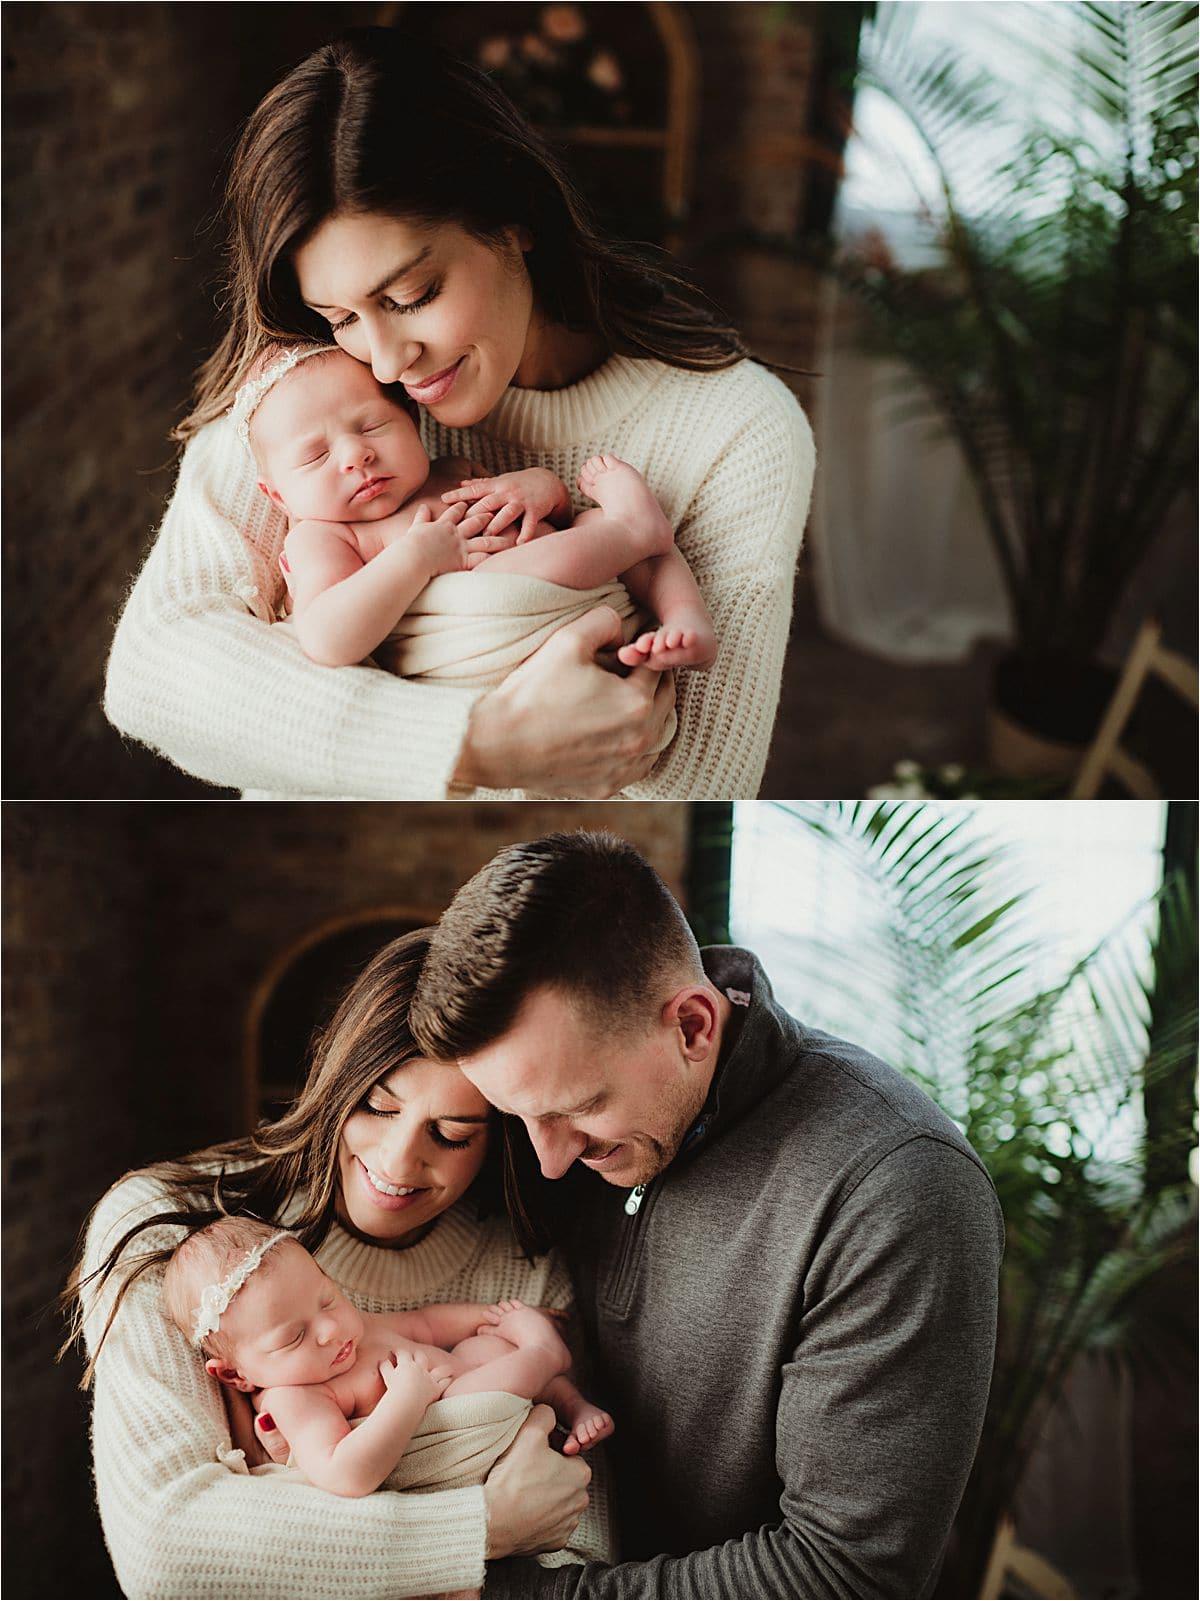 Studio Newborn Session with Parents